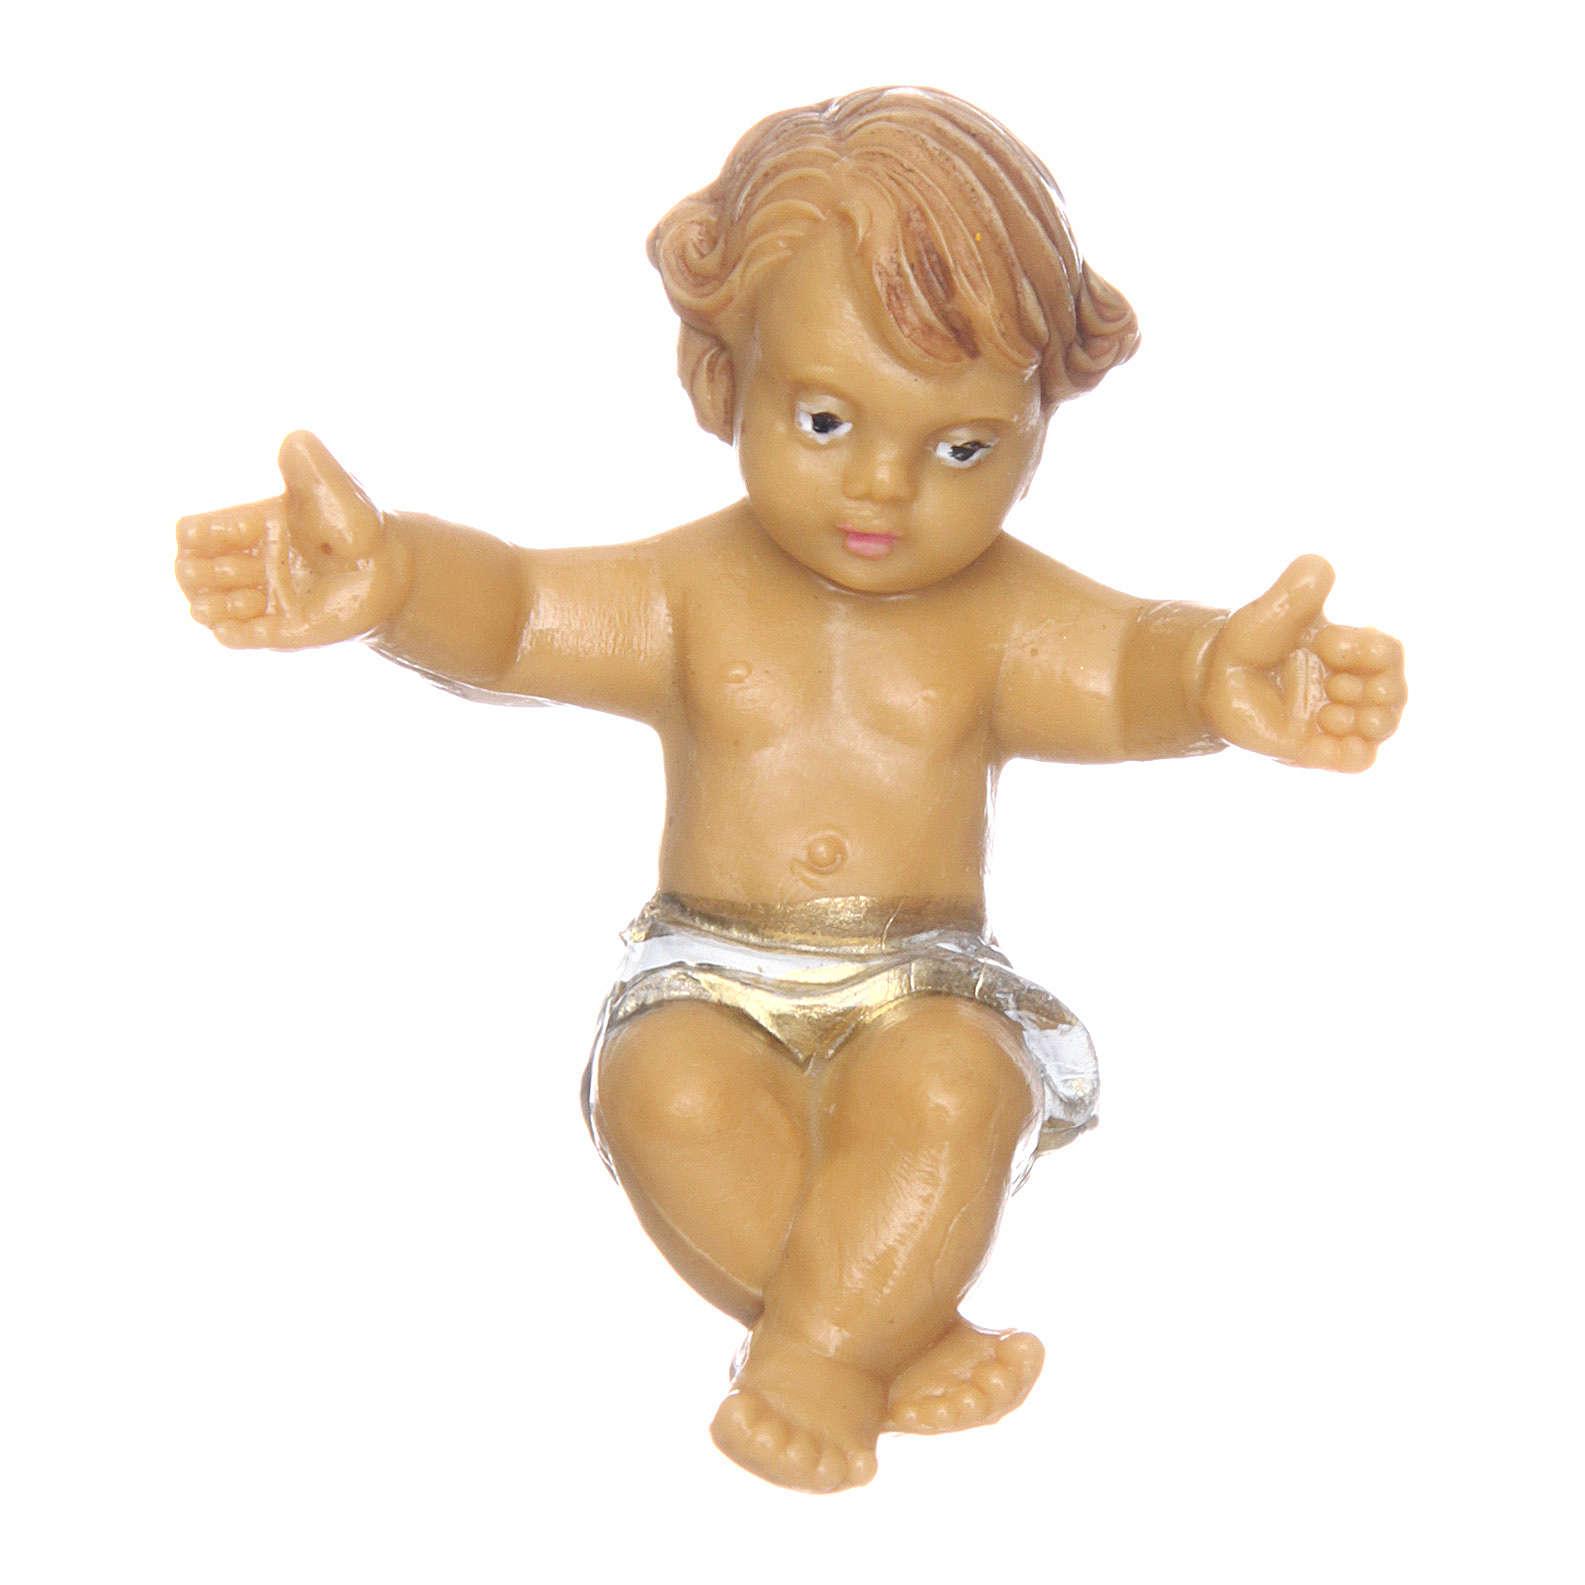 Baby Jesus with cradle for Nativity Scene 10 cm 3